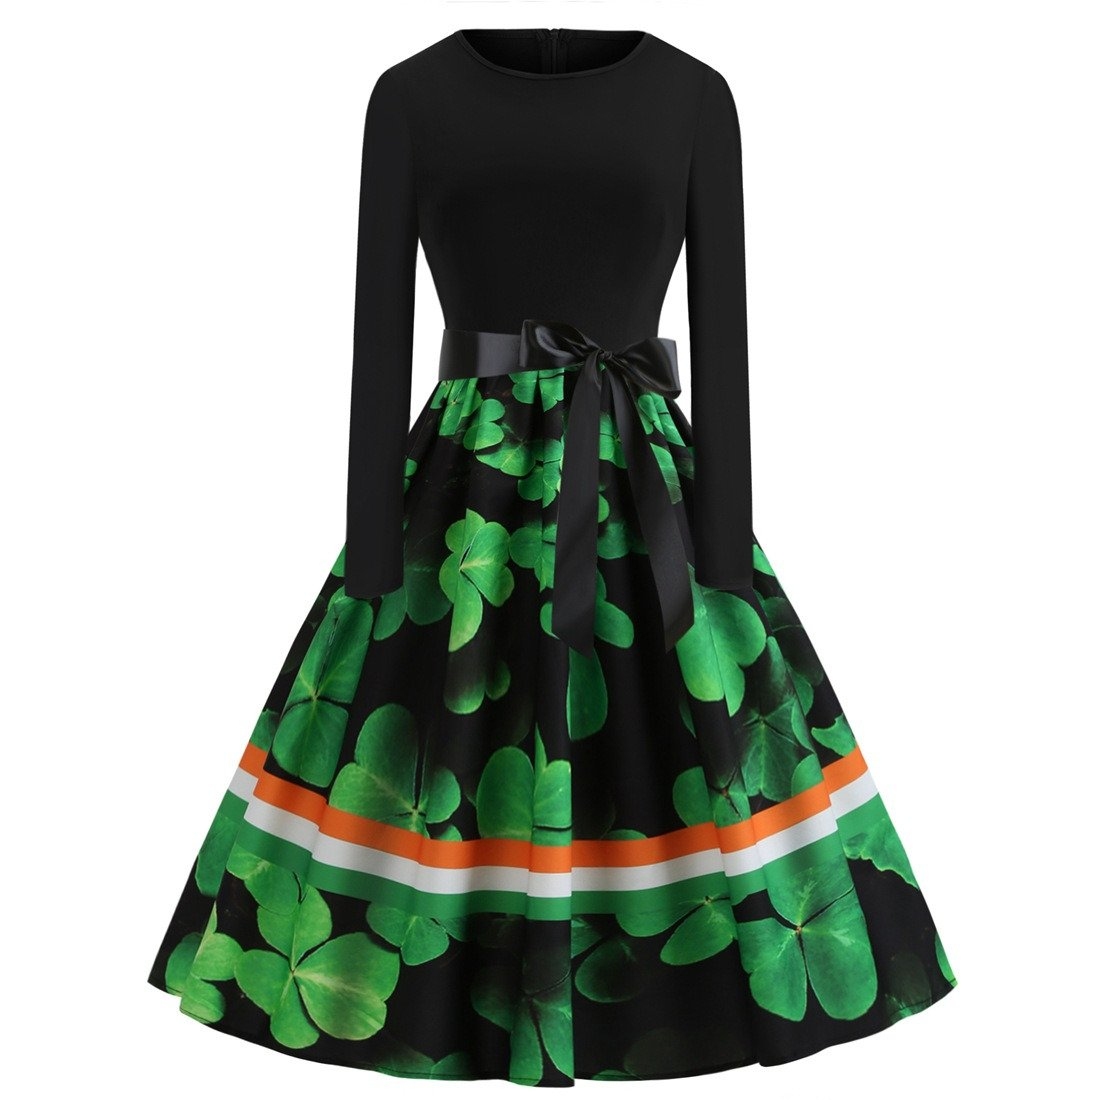 St. Patrick Plus Size Vintage Casual Dresses Retro Midi Party Dress Shamrocks Ireland Clothing